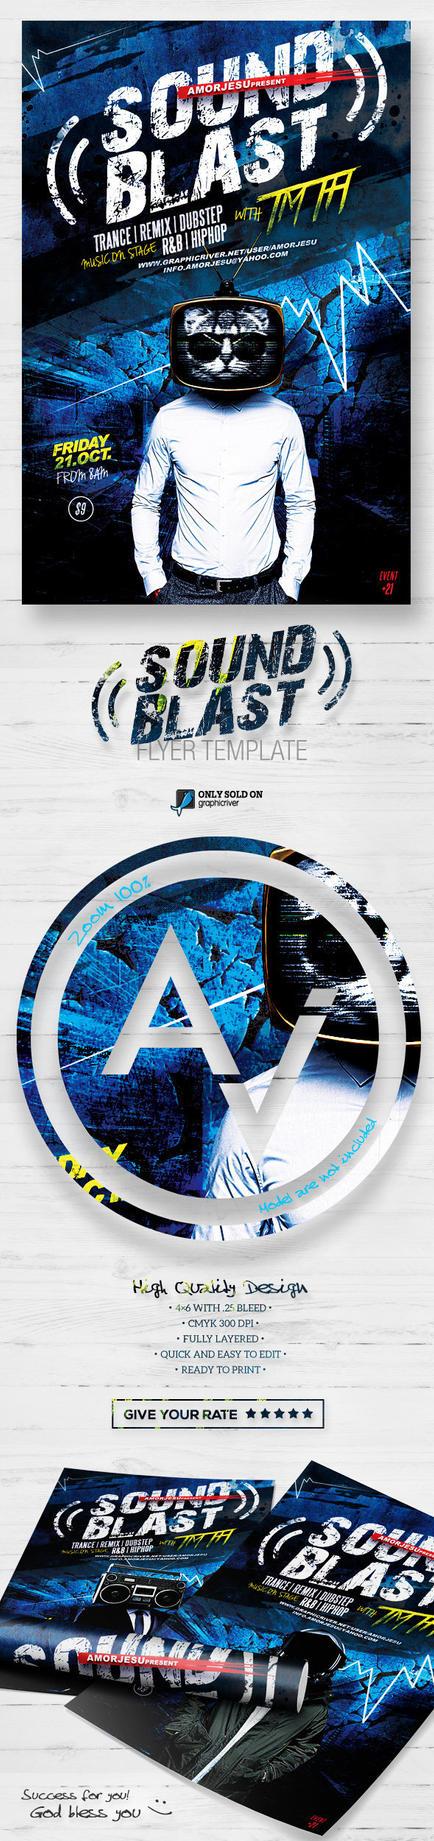 Sound Blast Flyer Template by amorjesu